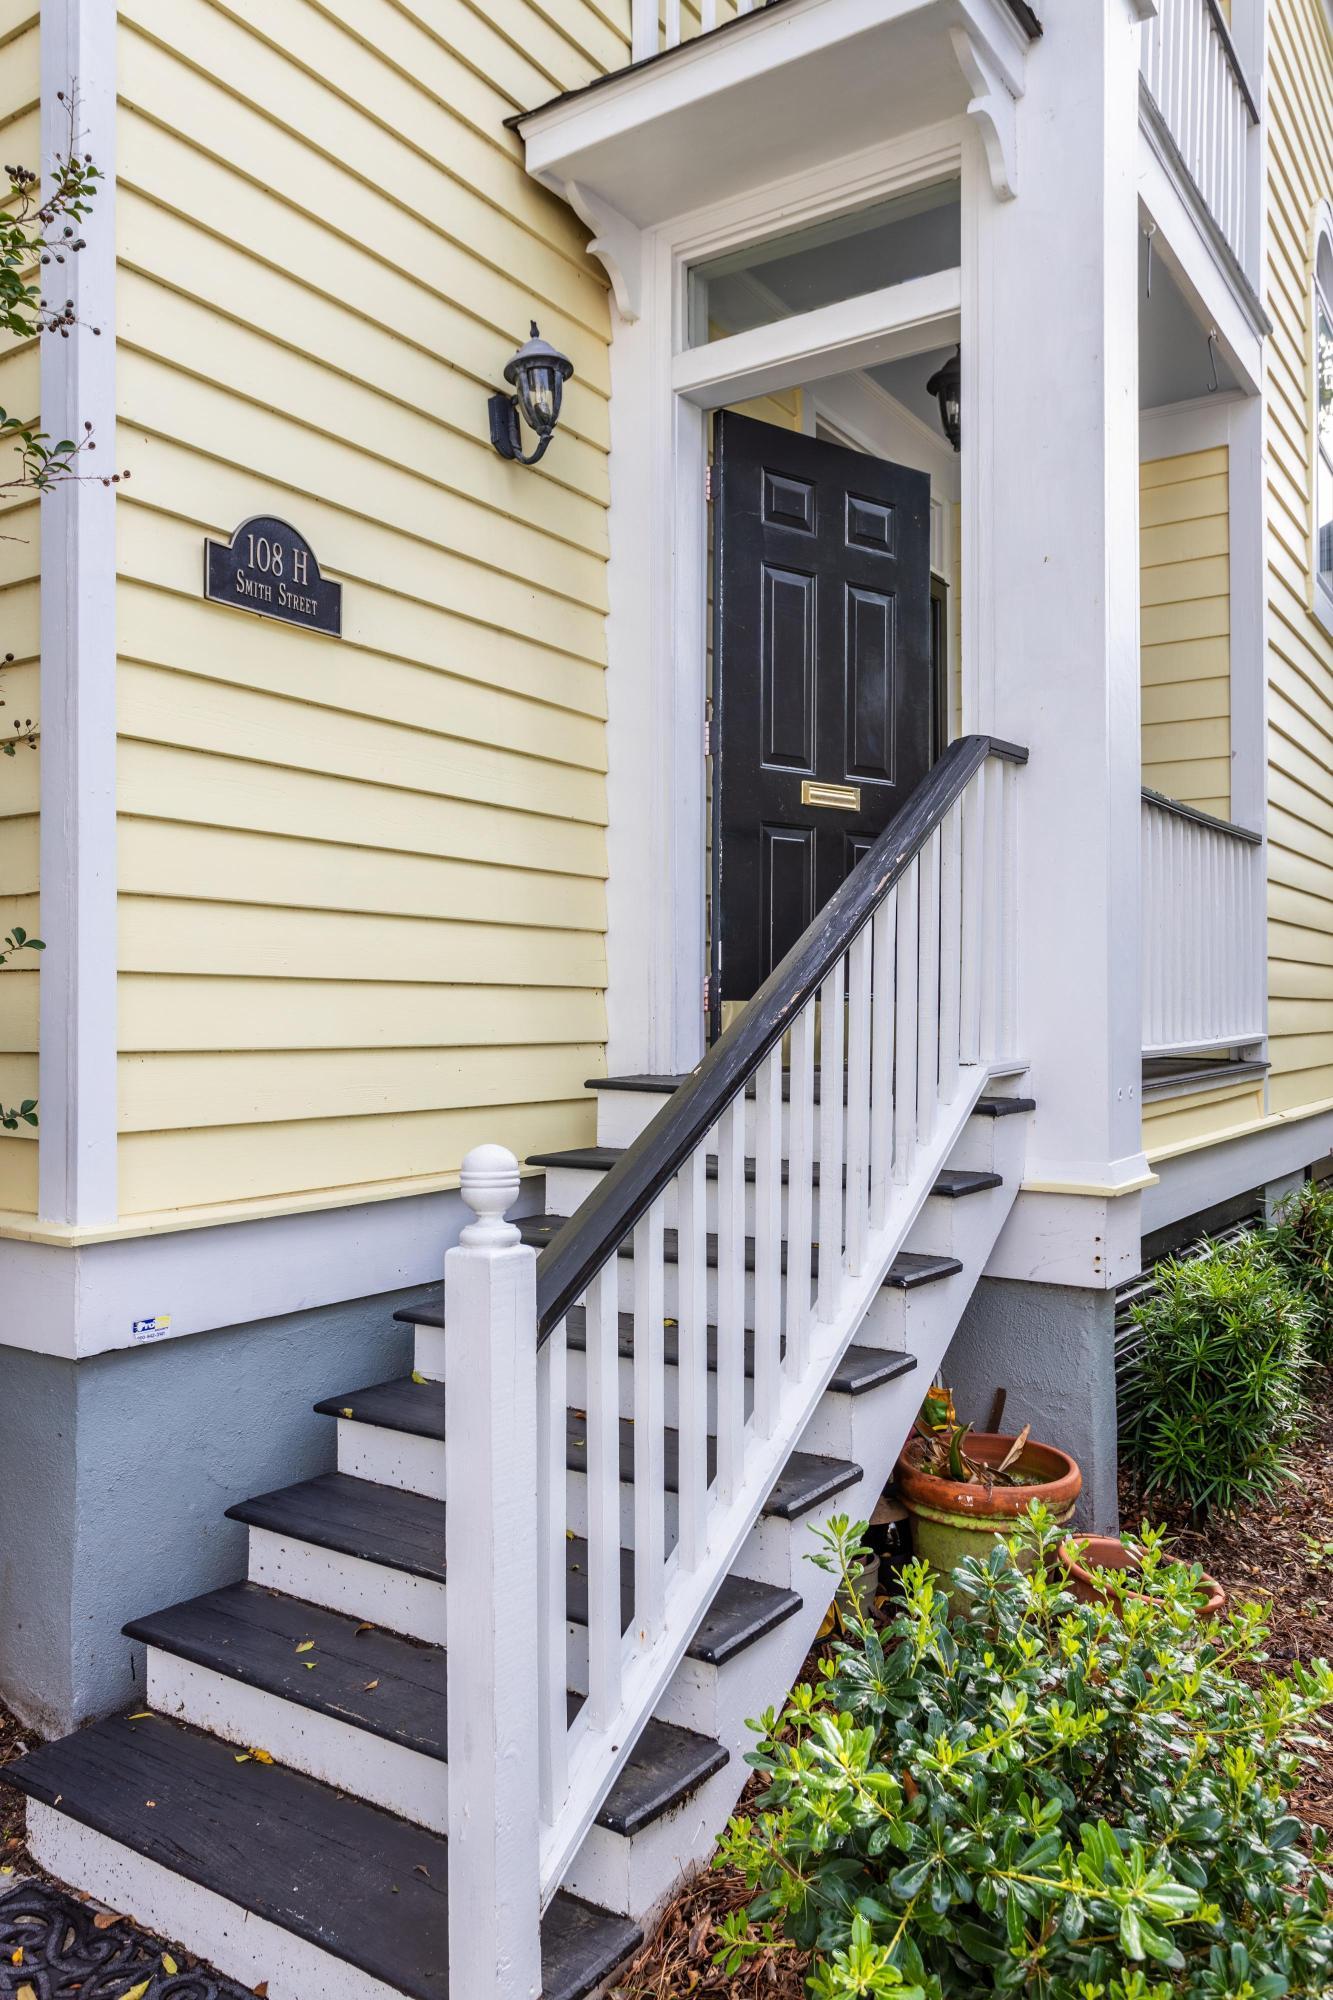 Radcliffeborough Homes For Sale - 108 Smith, Charleston, SC - 2